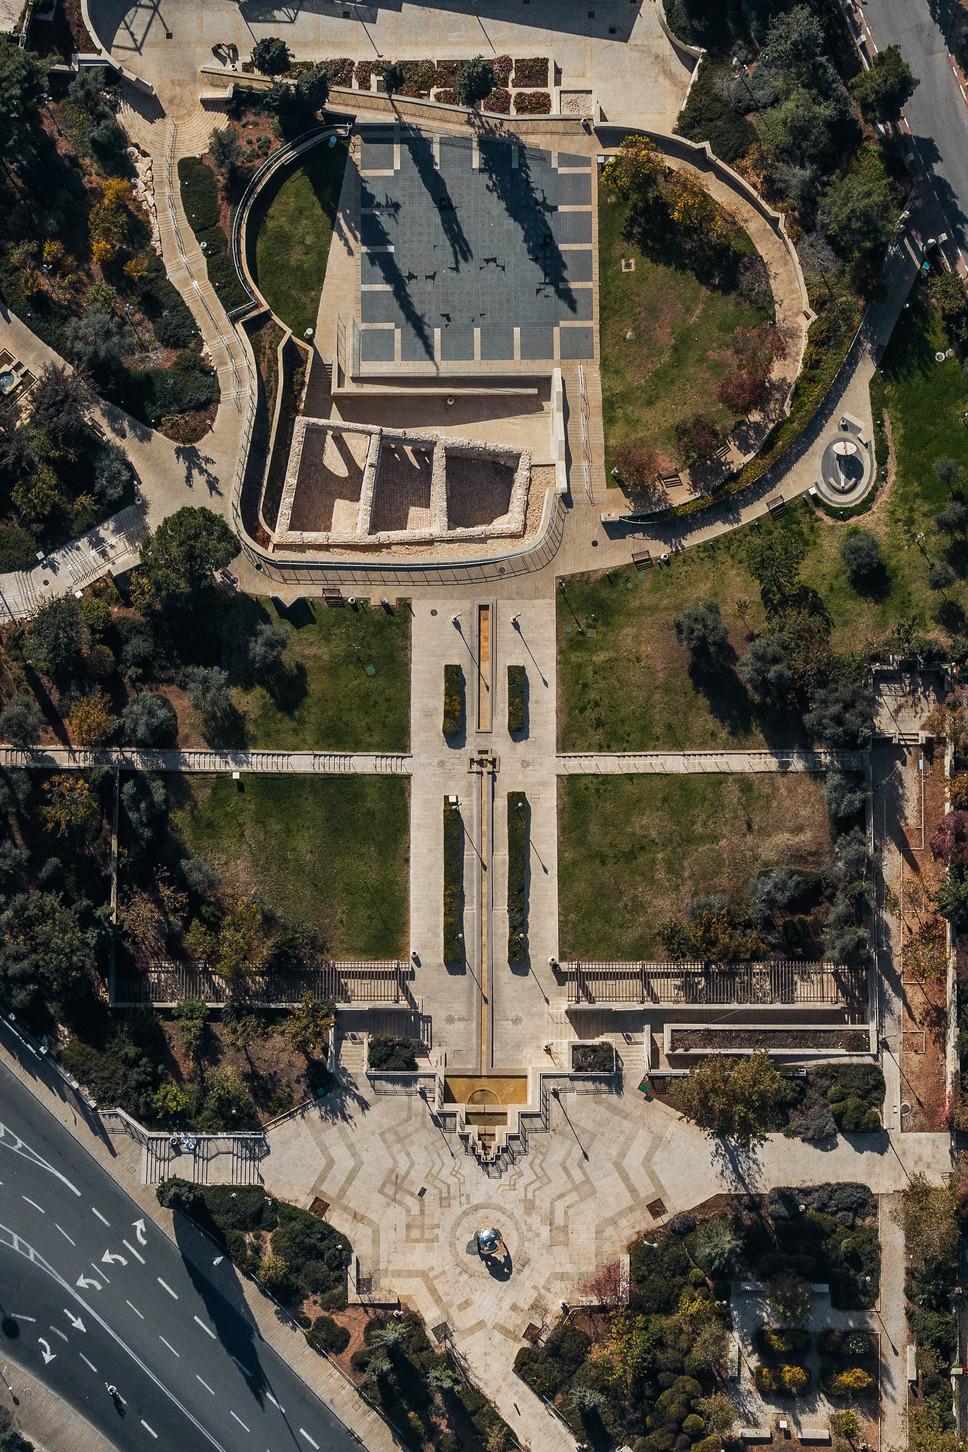 Jerusalem_West_Teddy Park 1.jpg